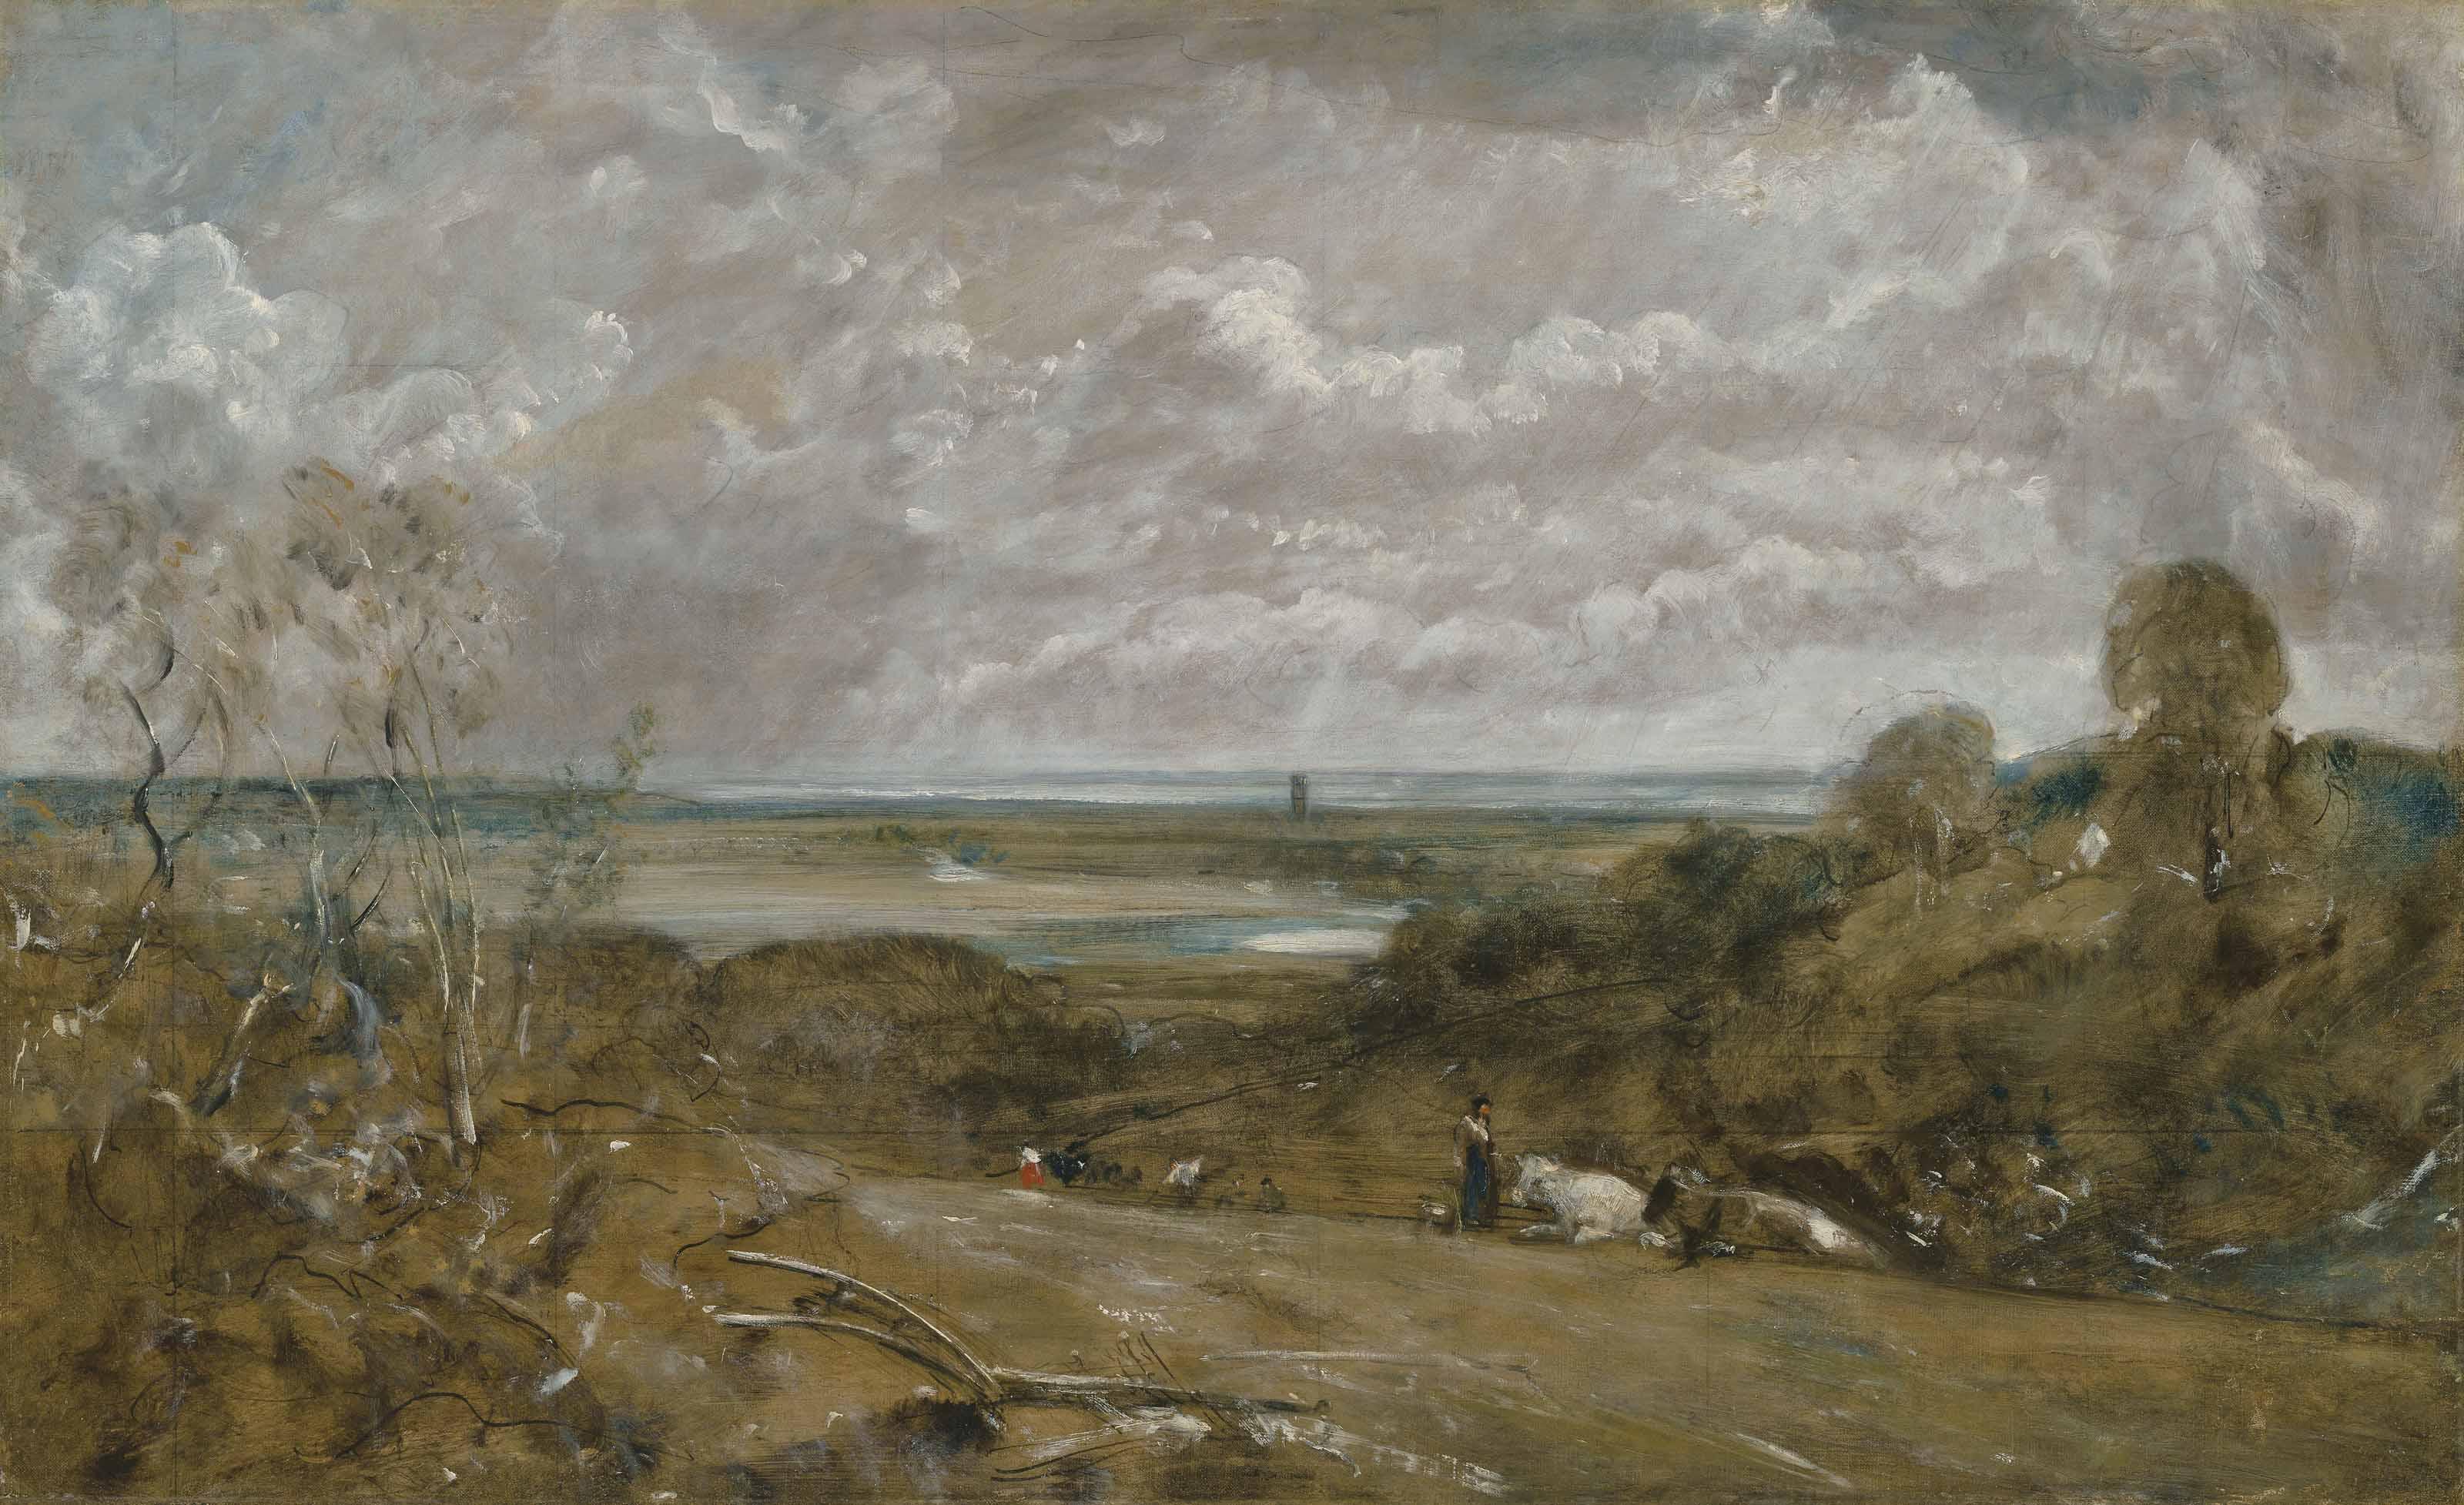 John Constable, R.A. (East Bergholt 1776-1837 London)